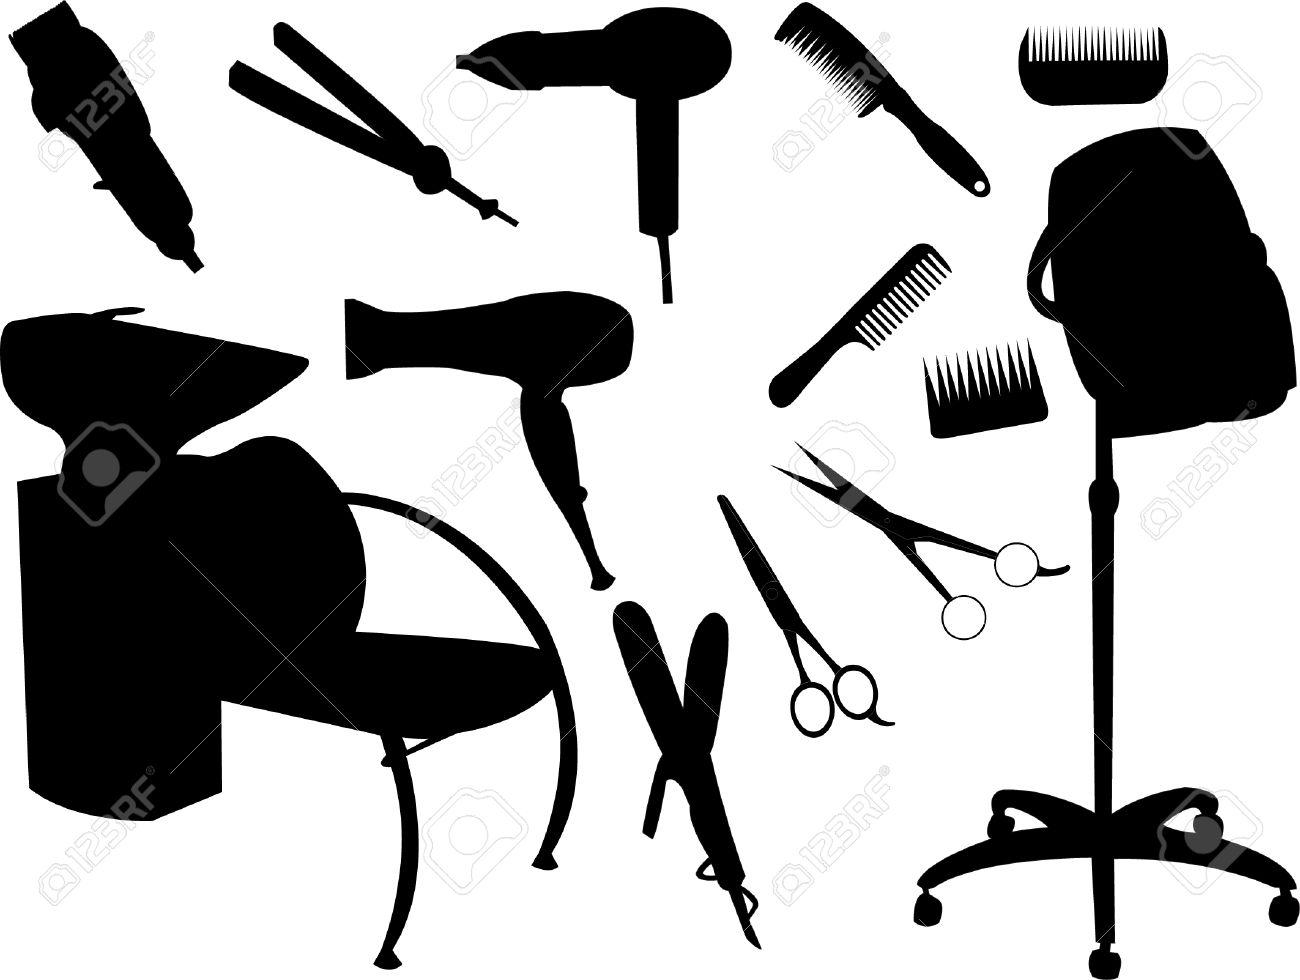 hair equipment silhouette Stock Vector - 8023752